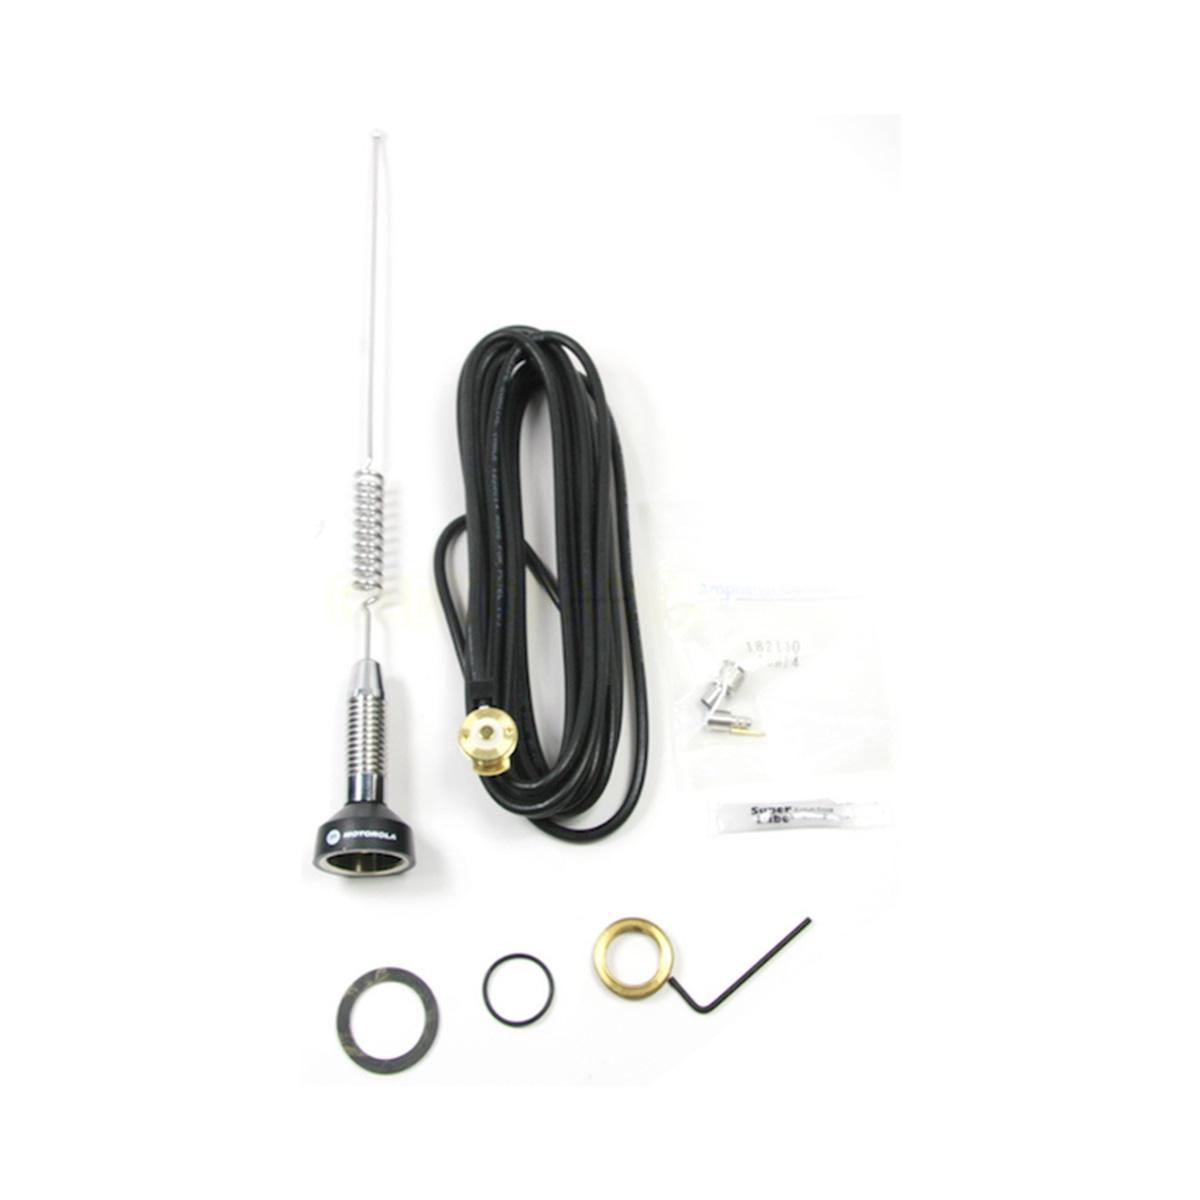 Antena Motorola para radio base 700/800 MHz tipo Colineal HAF4017A